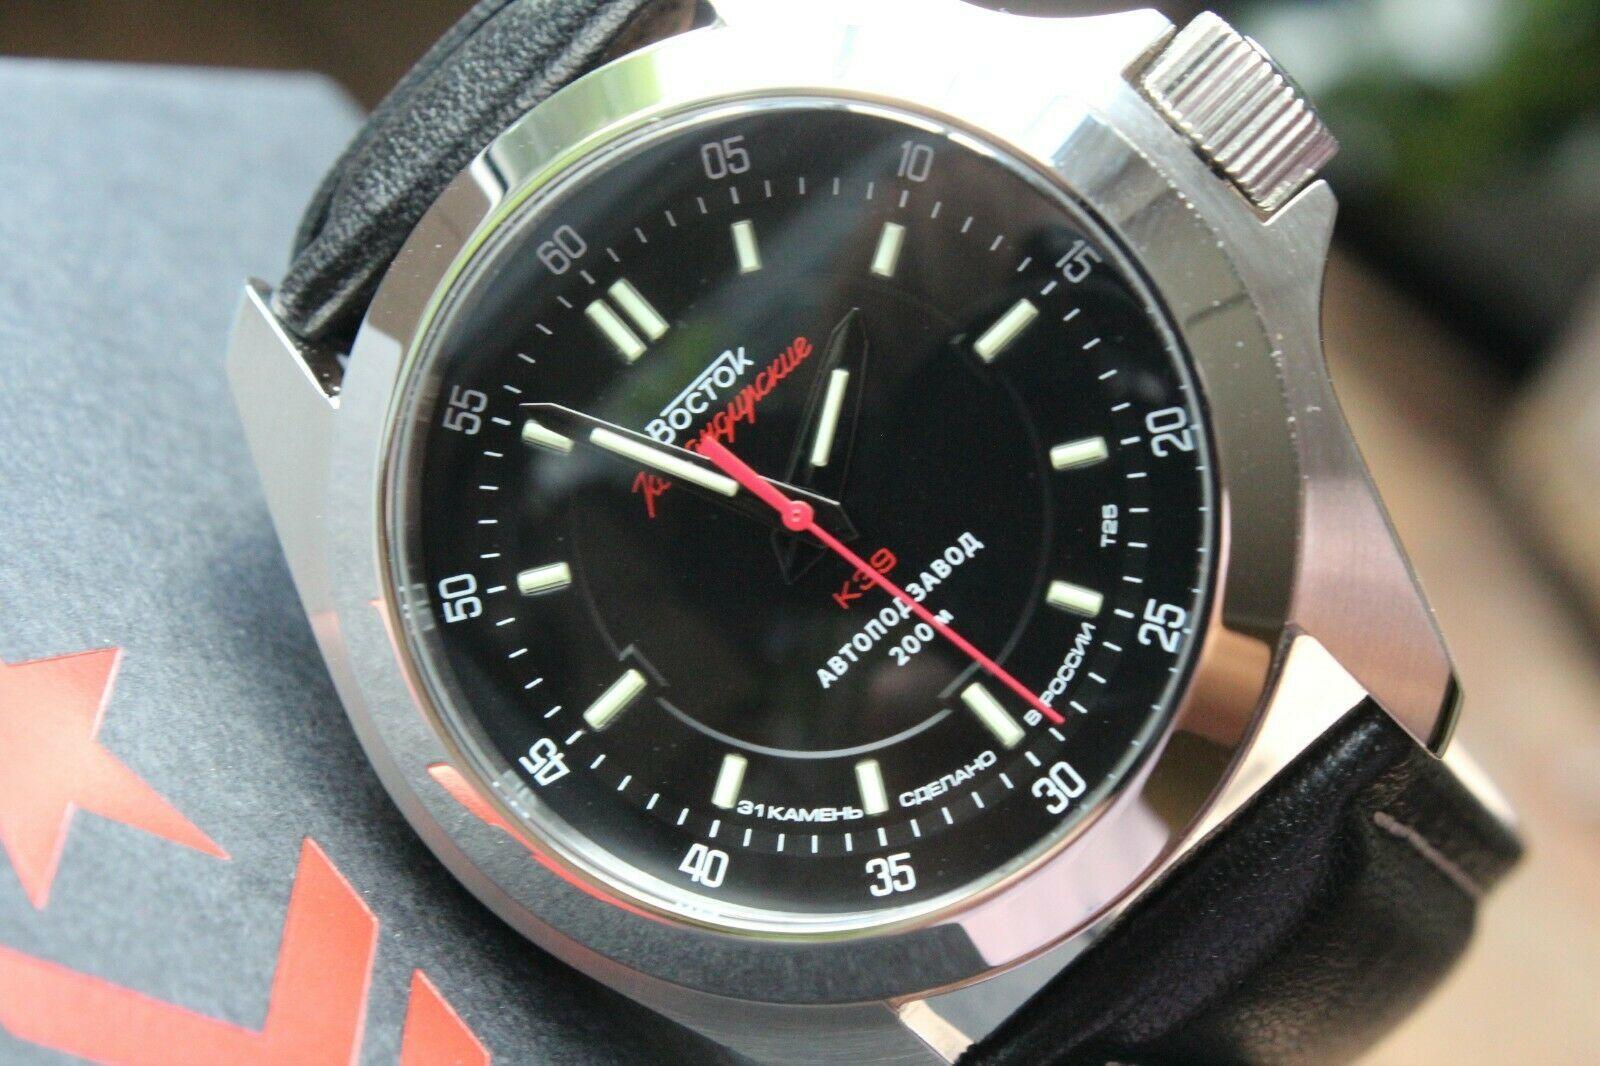 Vostok Komandirsky Russian Mechanical Automatic K-39 Military wristwatch 390775